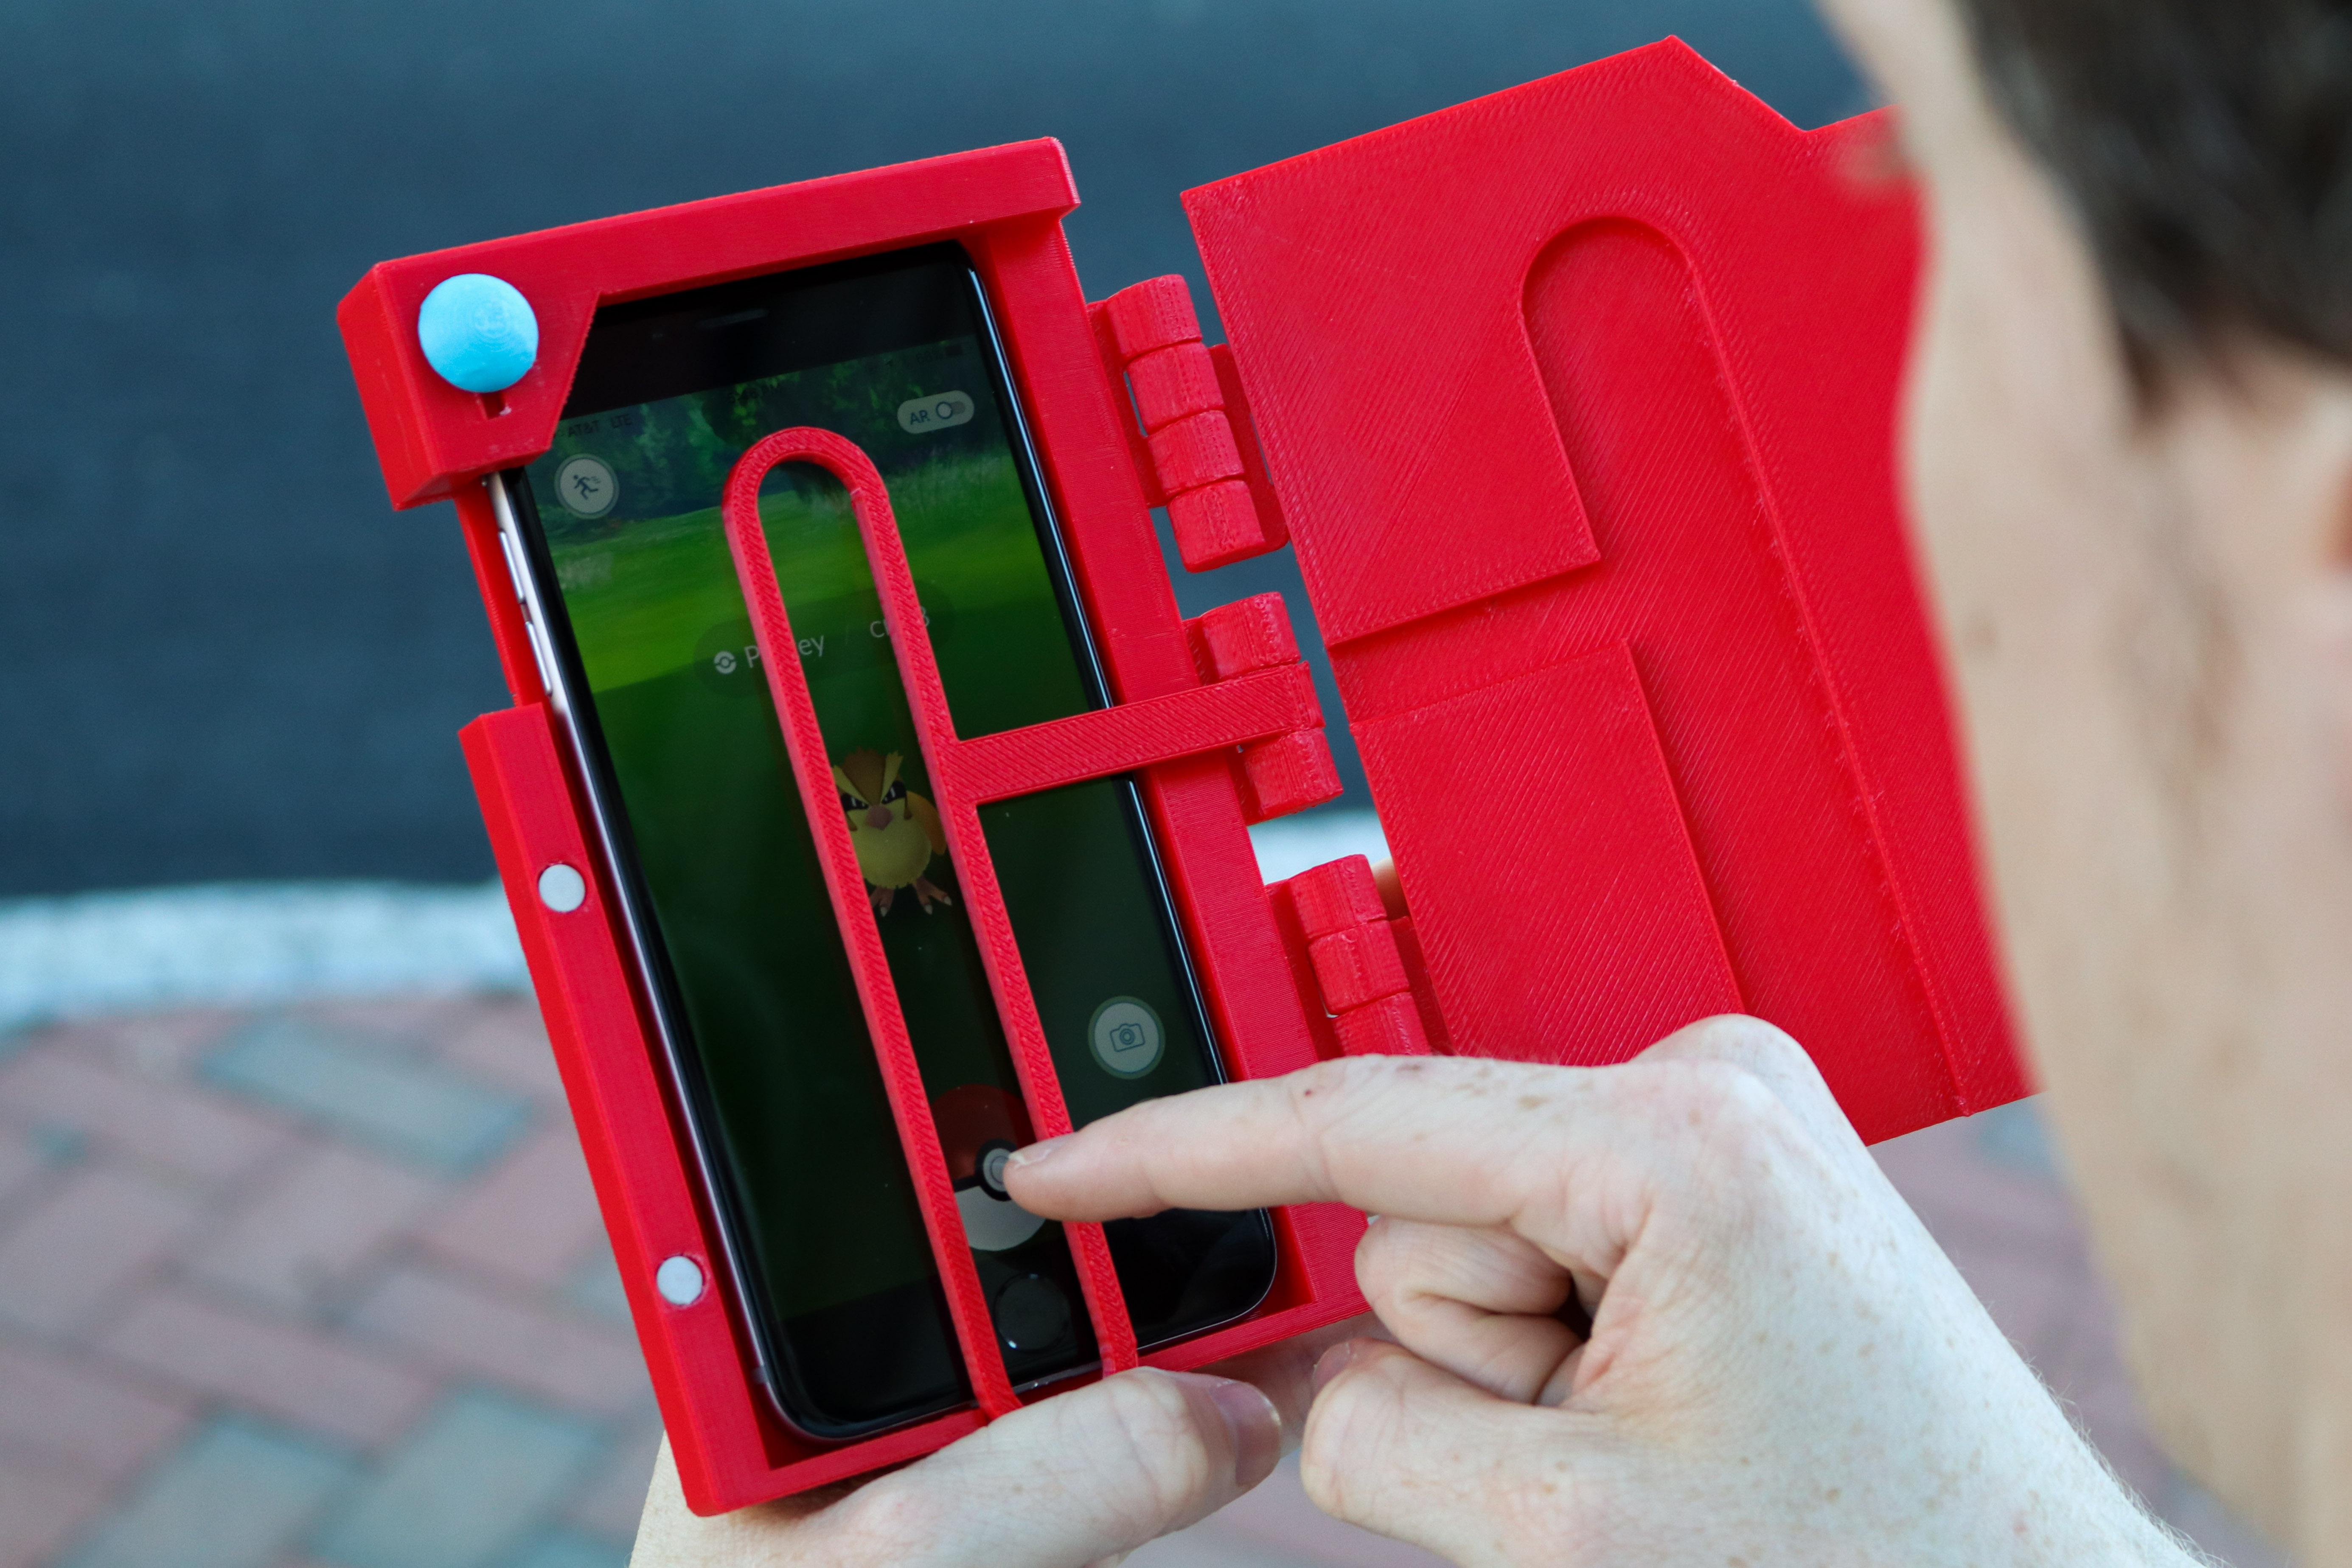 online retailer 3fb44 ebd12 The GO Case: A Pokedex Aimer Phone Case! by 3DCentralVA - Thingiverse